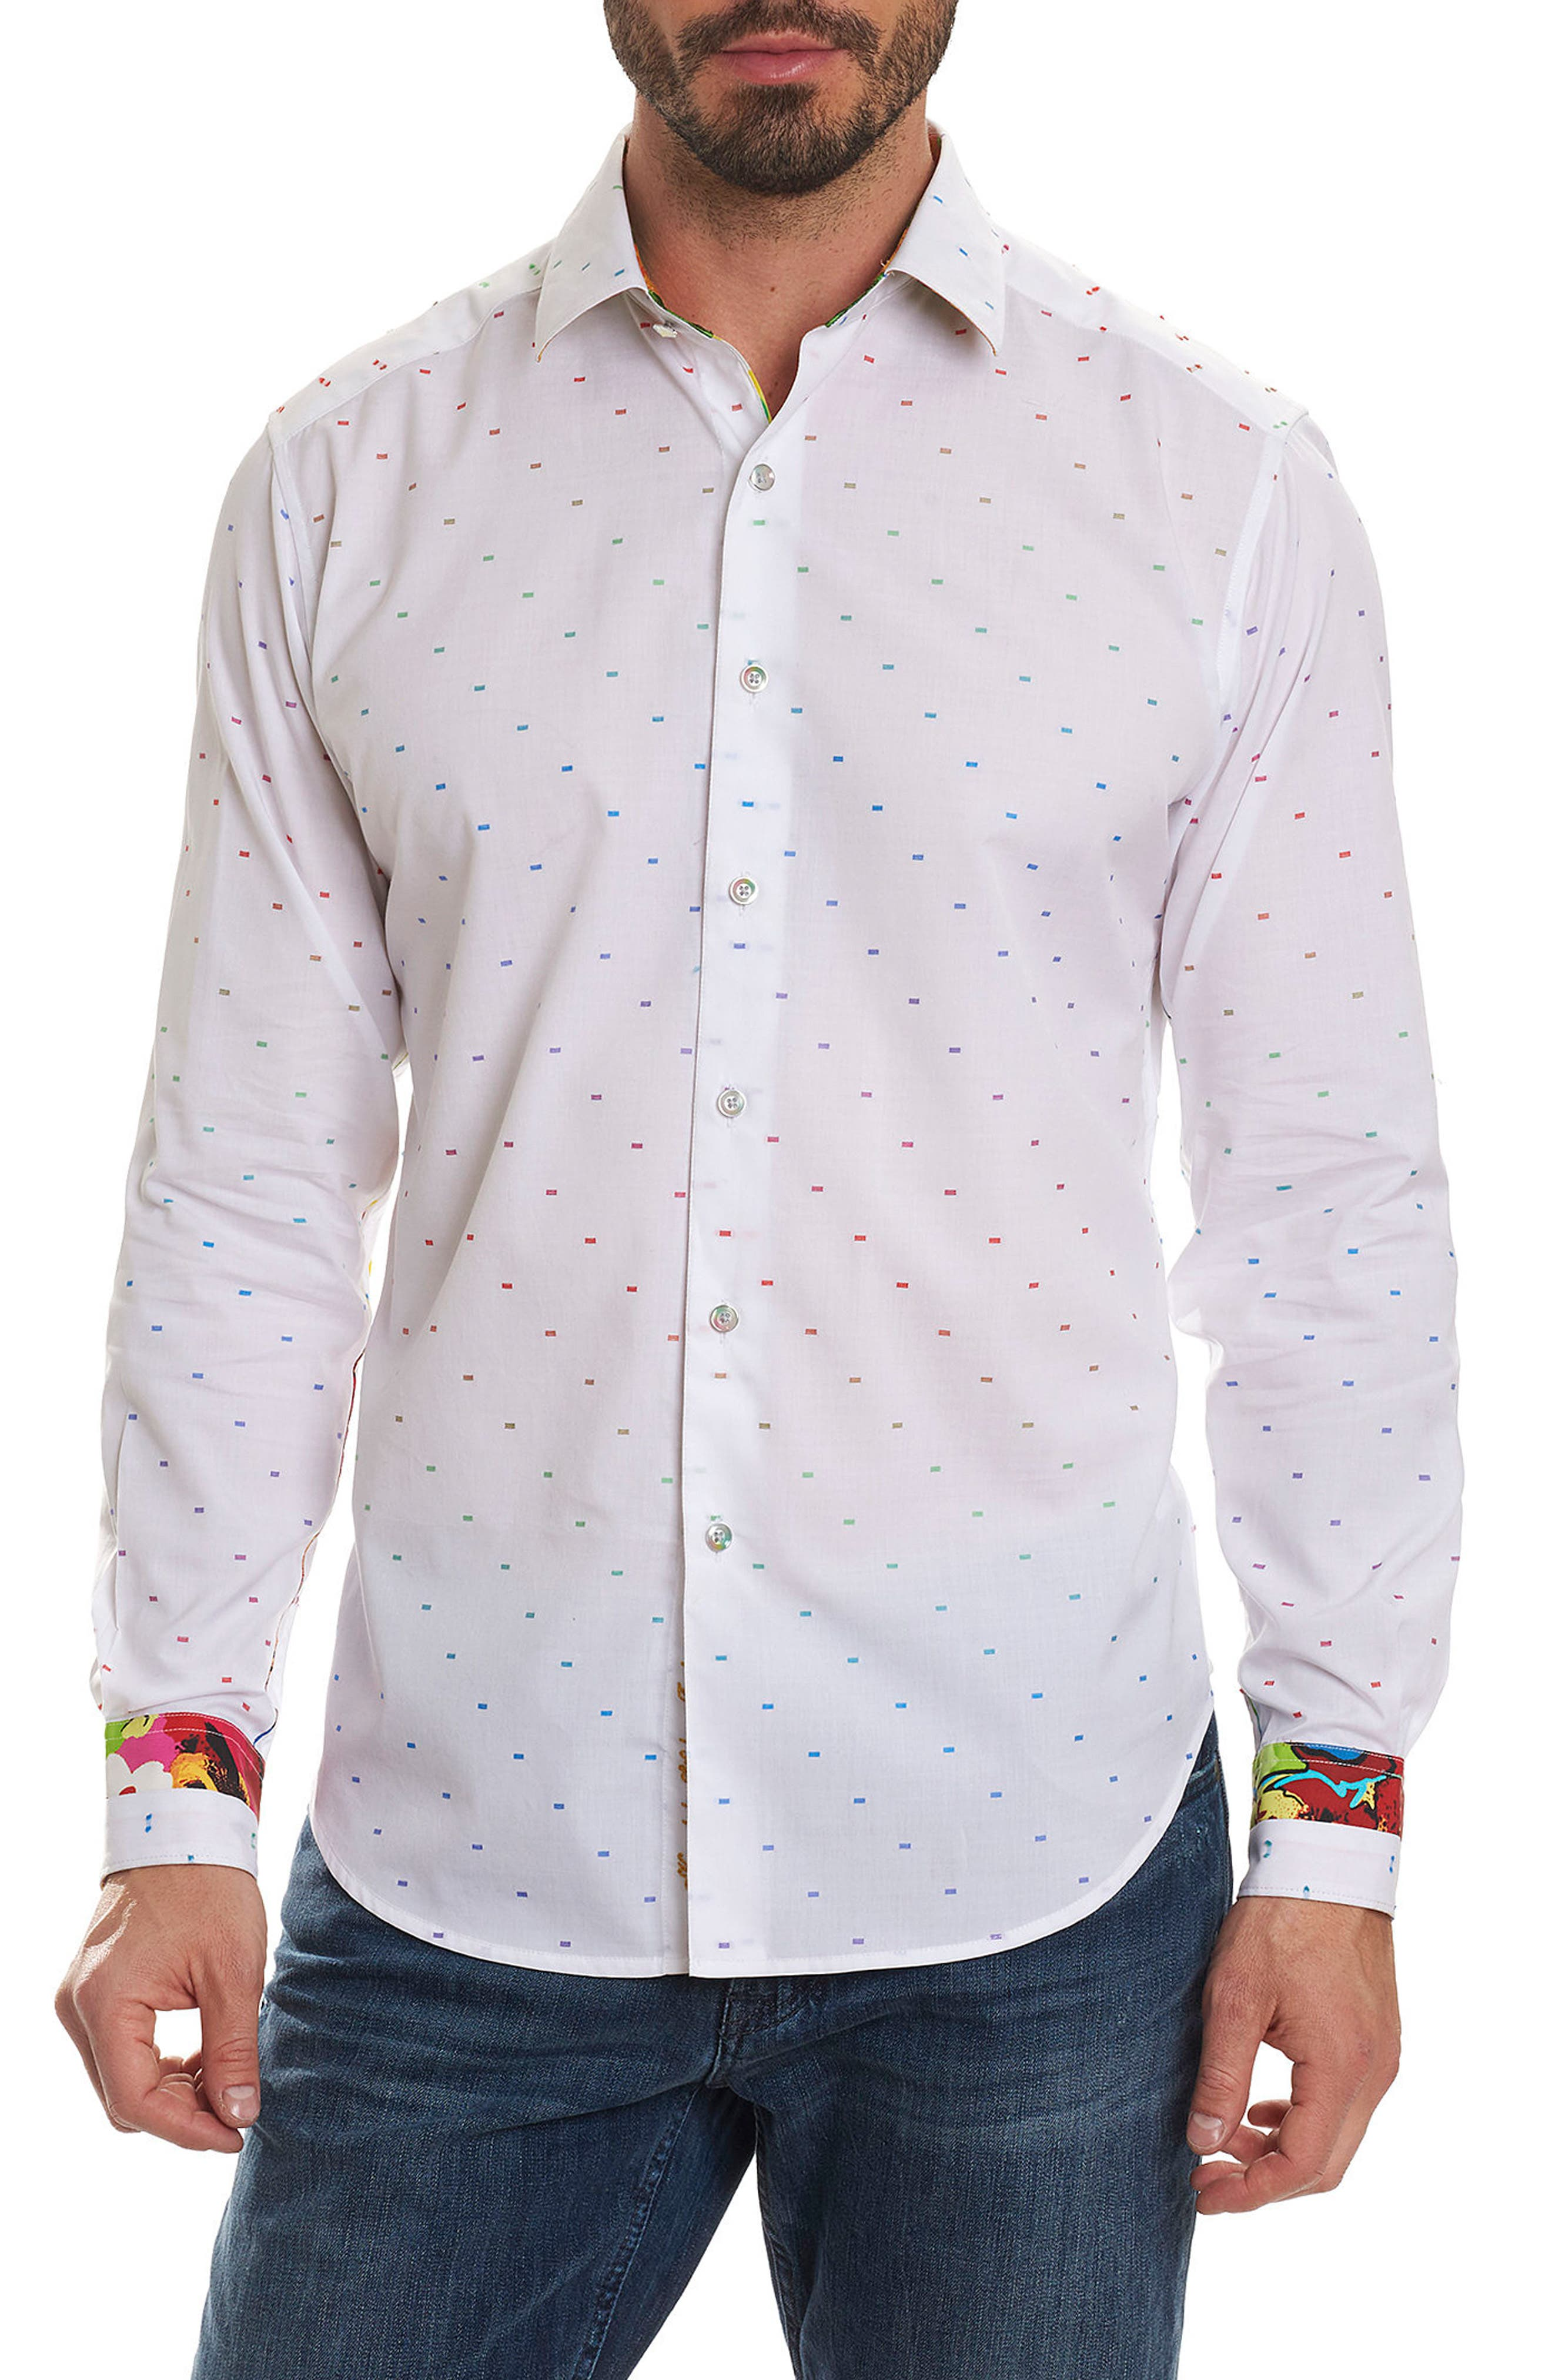 Karyan Limited Edition Classic Fit Sport Shirt,                             Main thumbnail 1, color,                             100